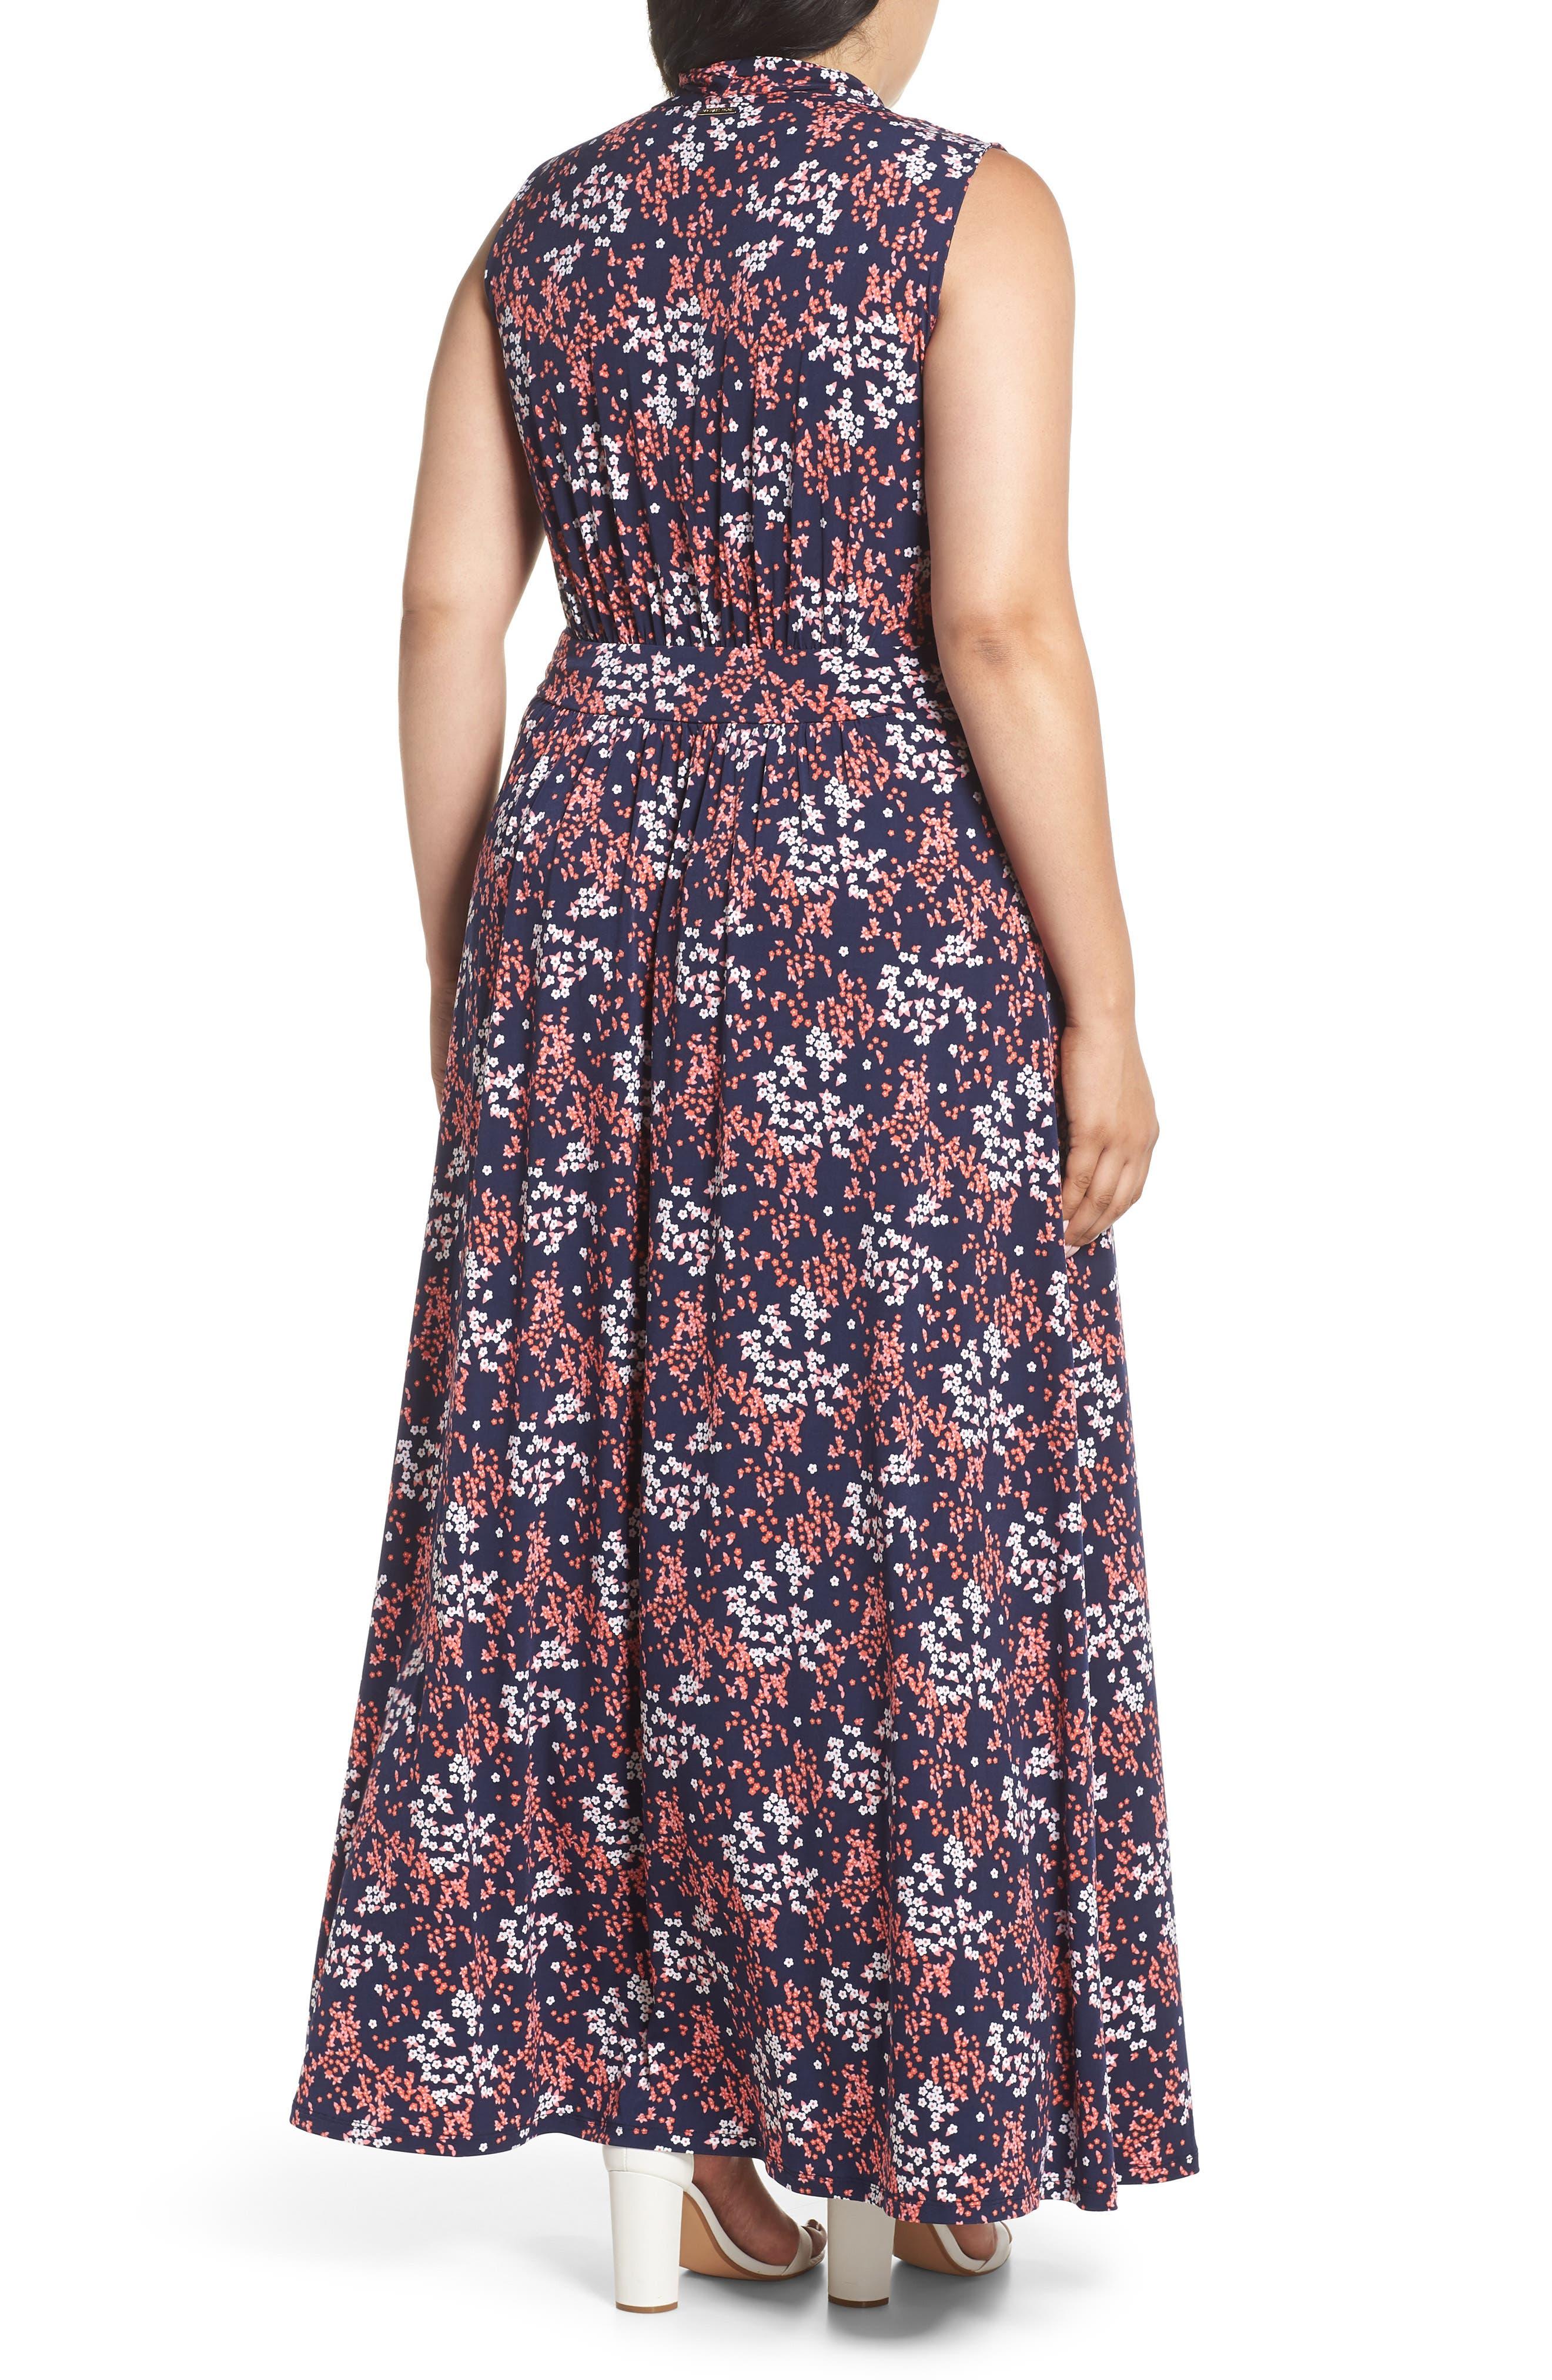 Floral Print Maxi Dress,                             Alternate thumbnail 2, color,                             671